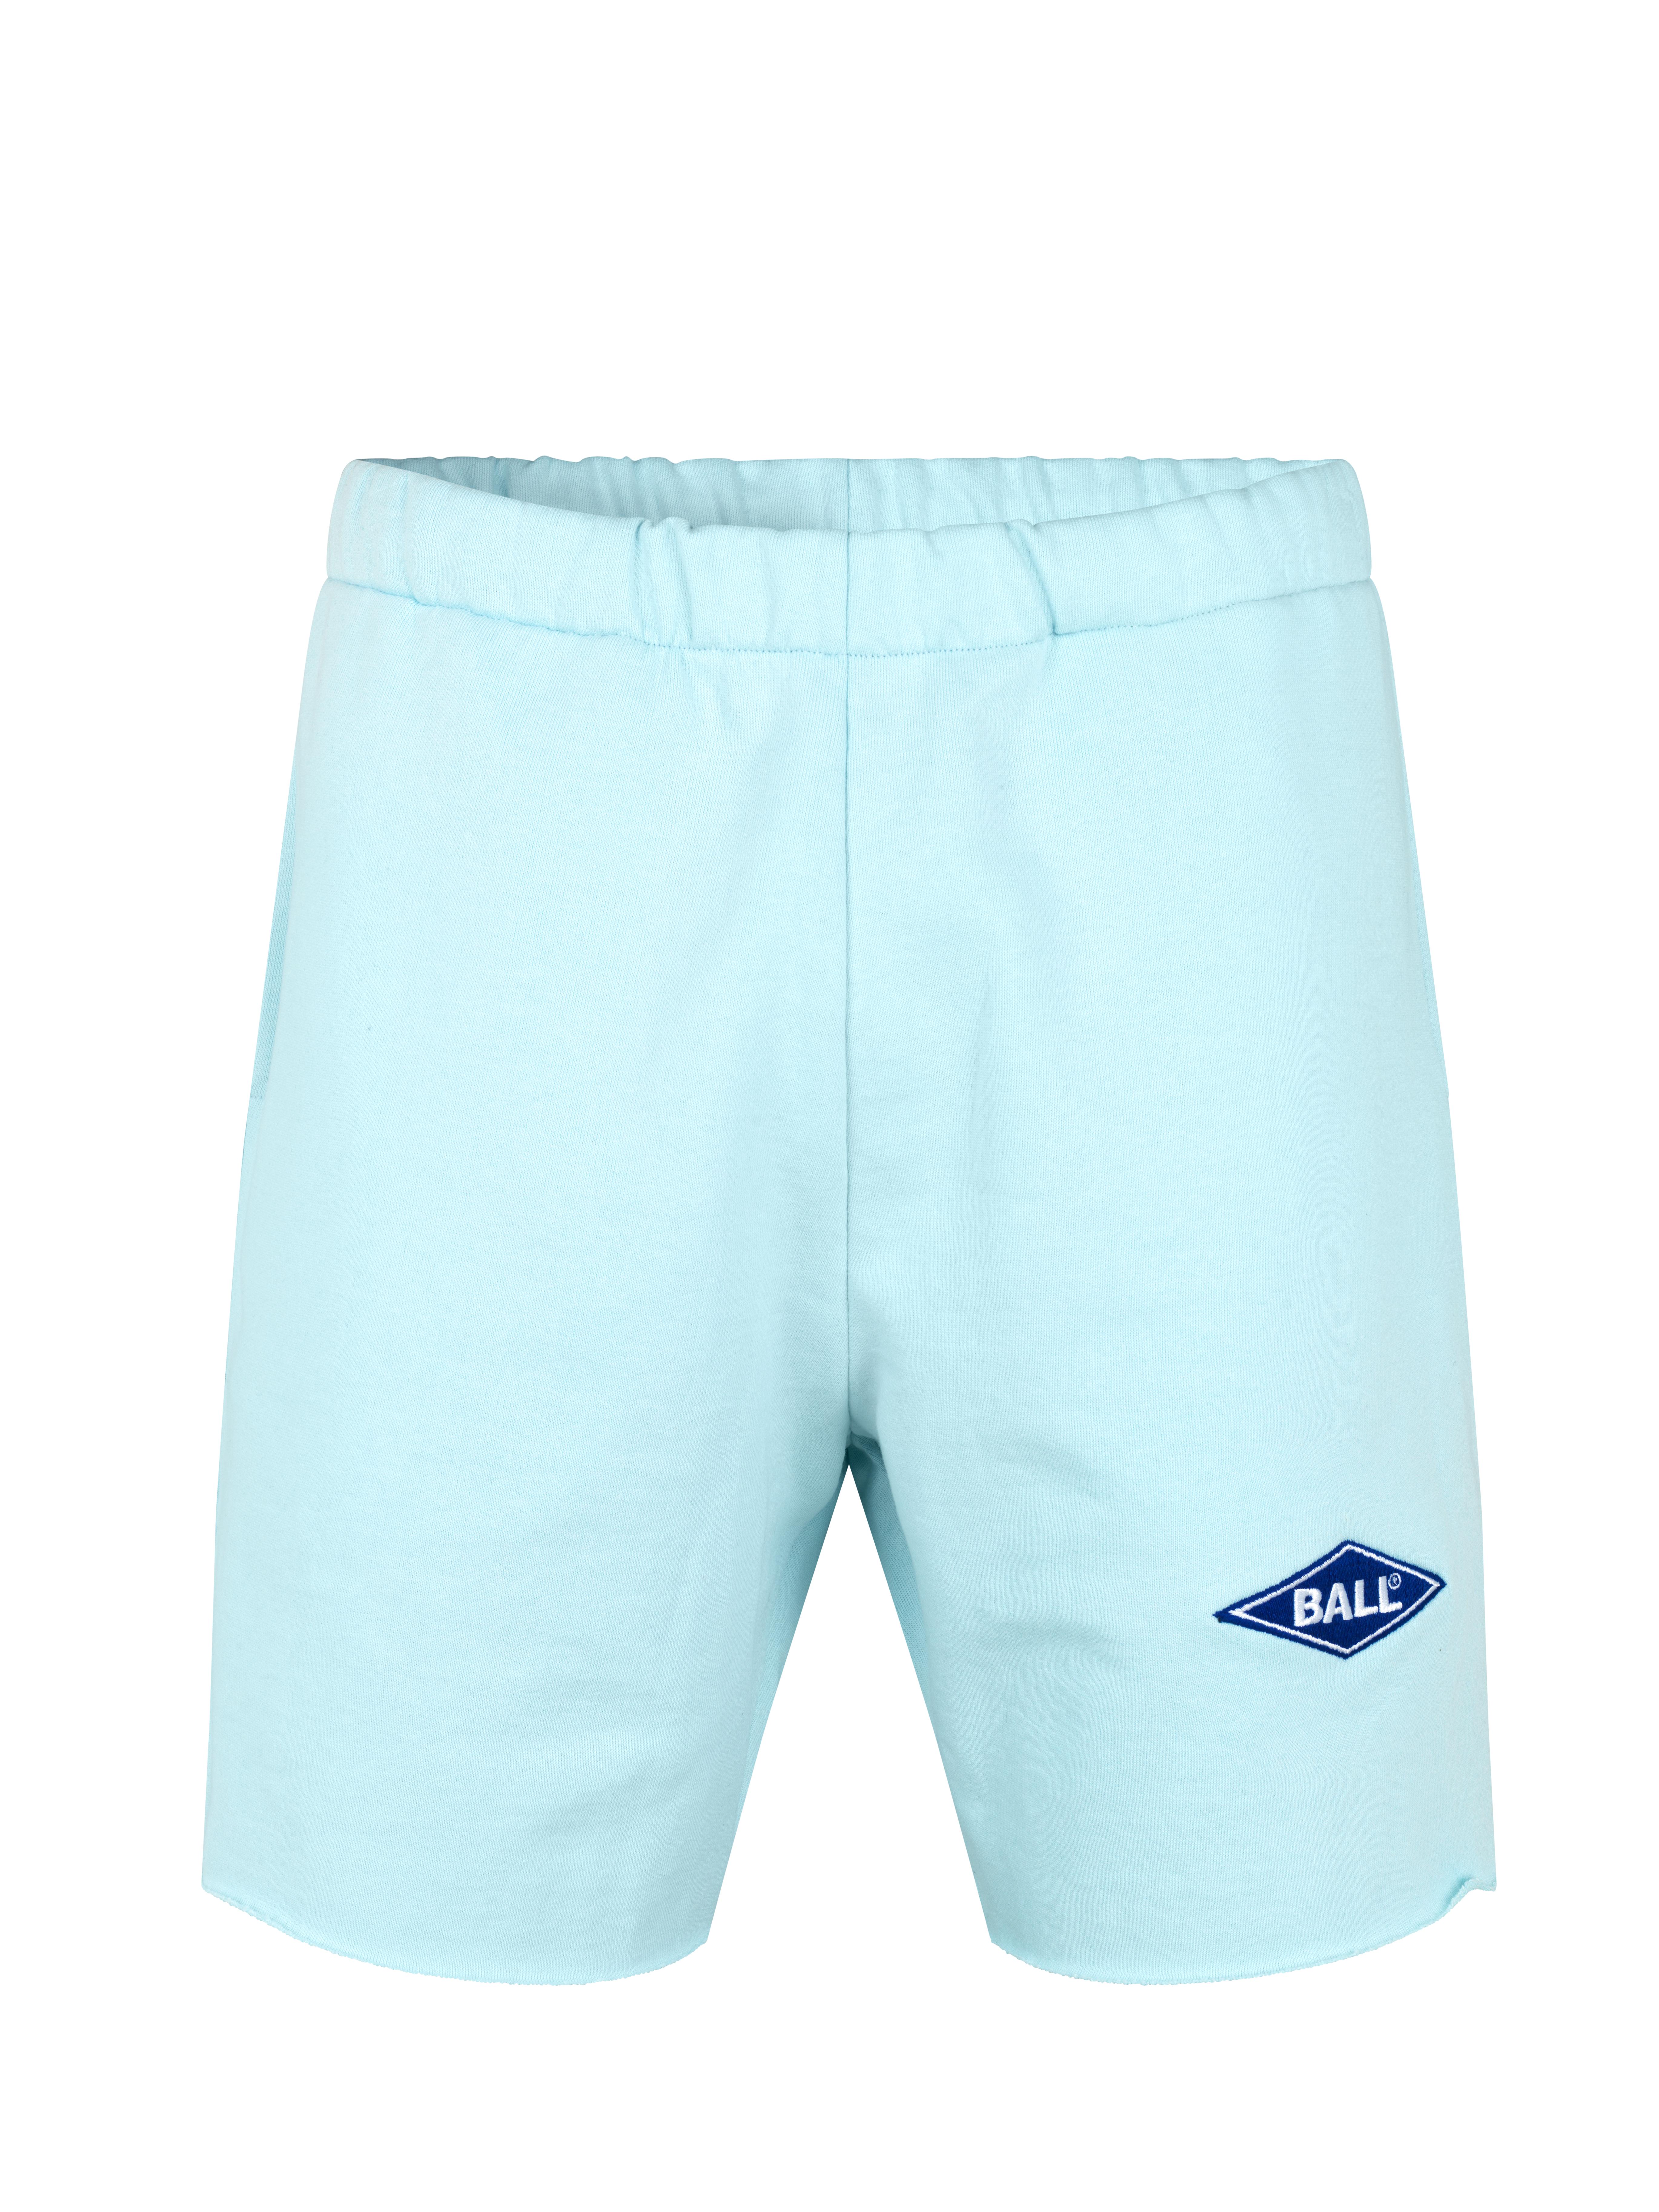 BALL Original Shorts, ice blue, large